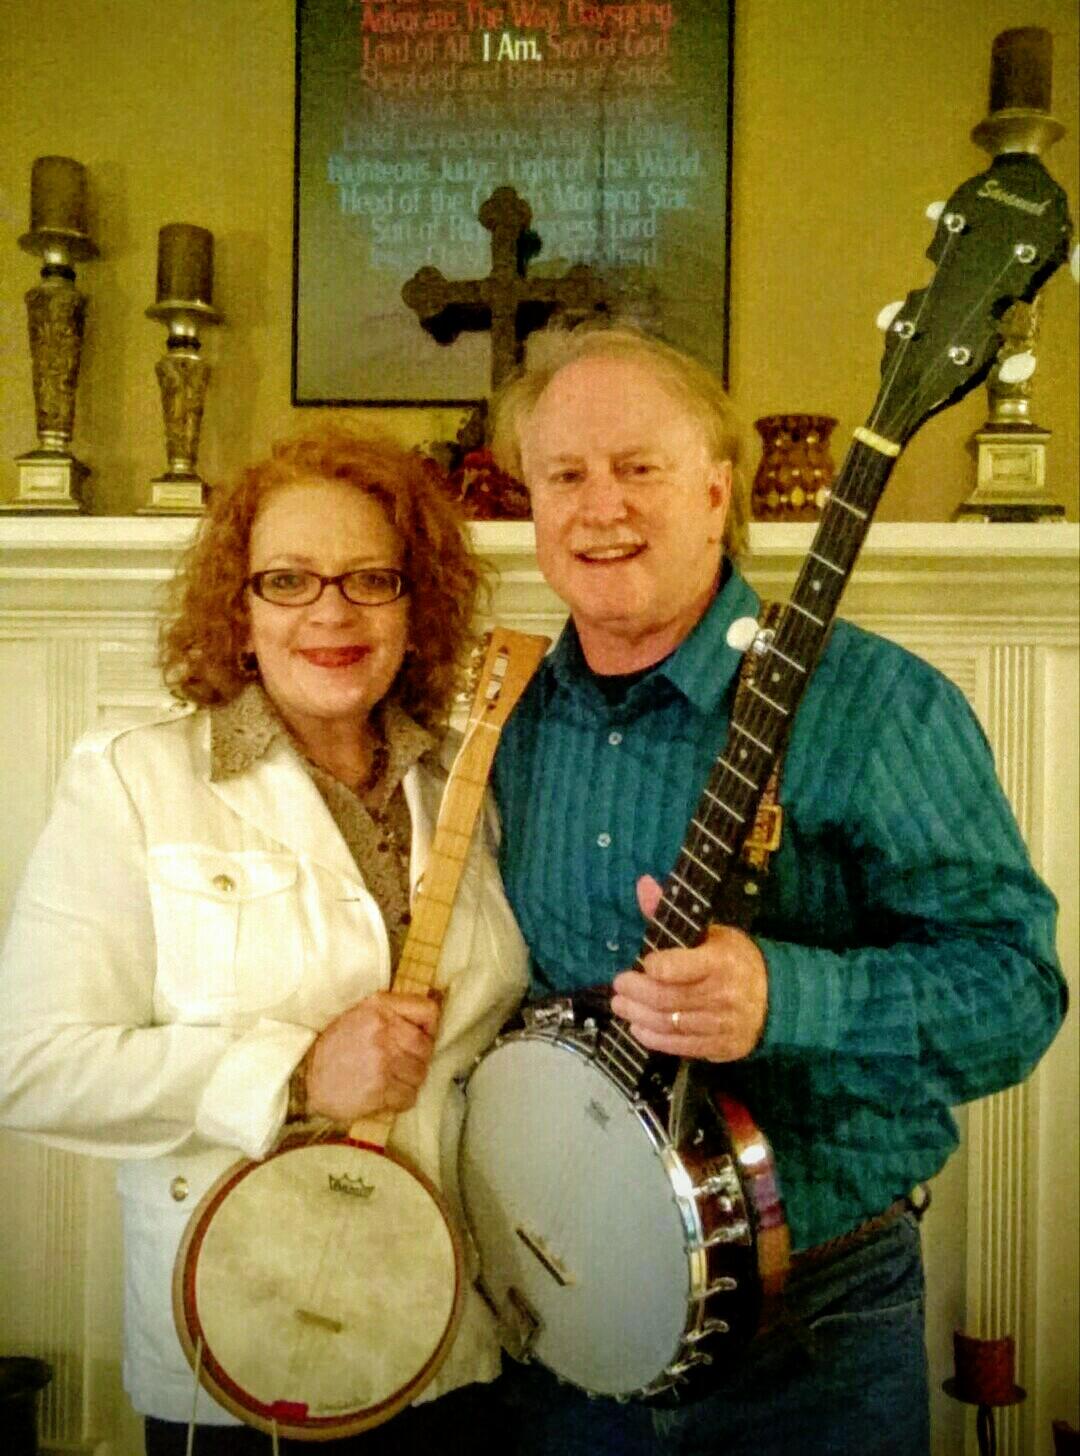 IMG Joey and Angela Banjo pic.jpg